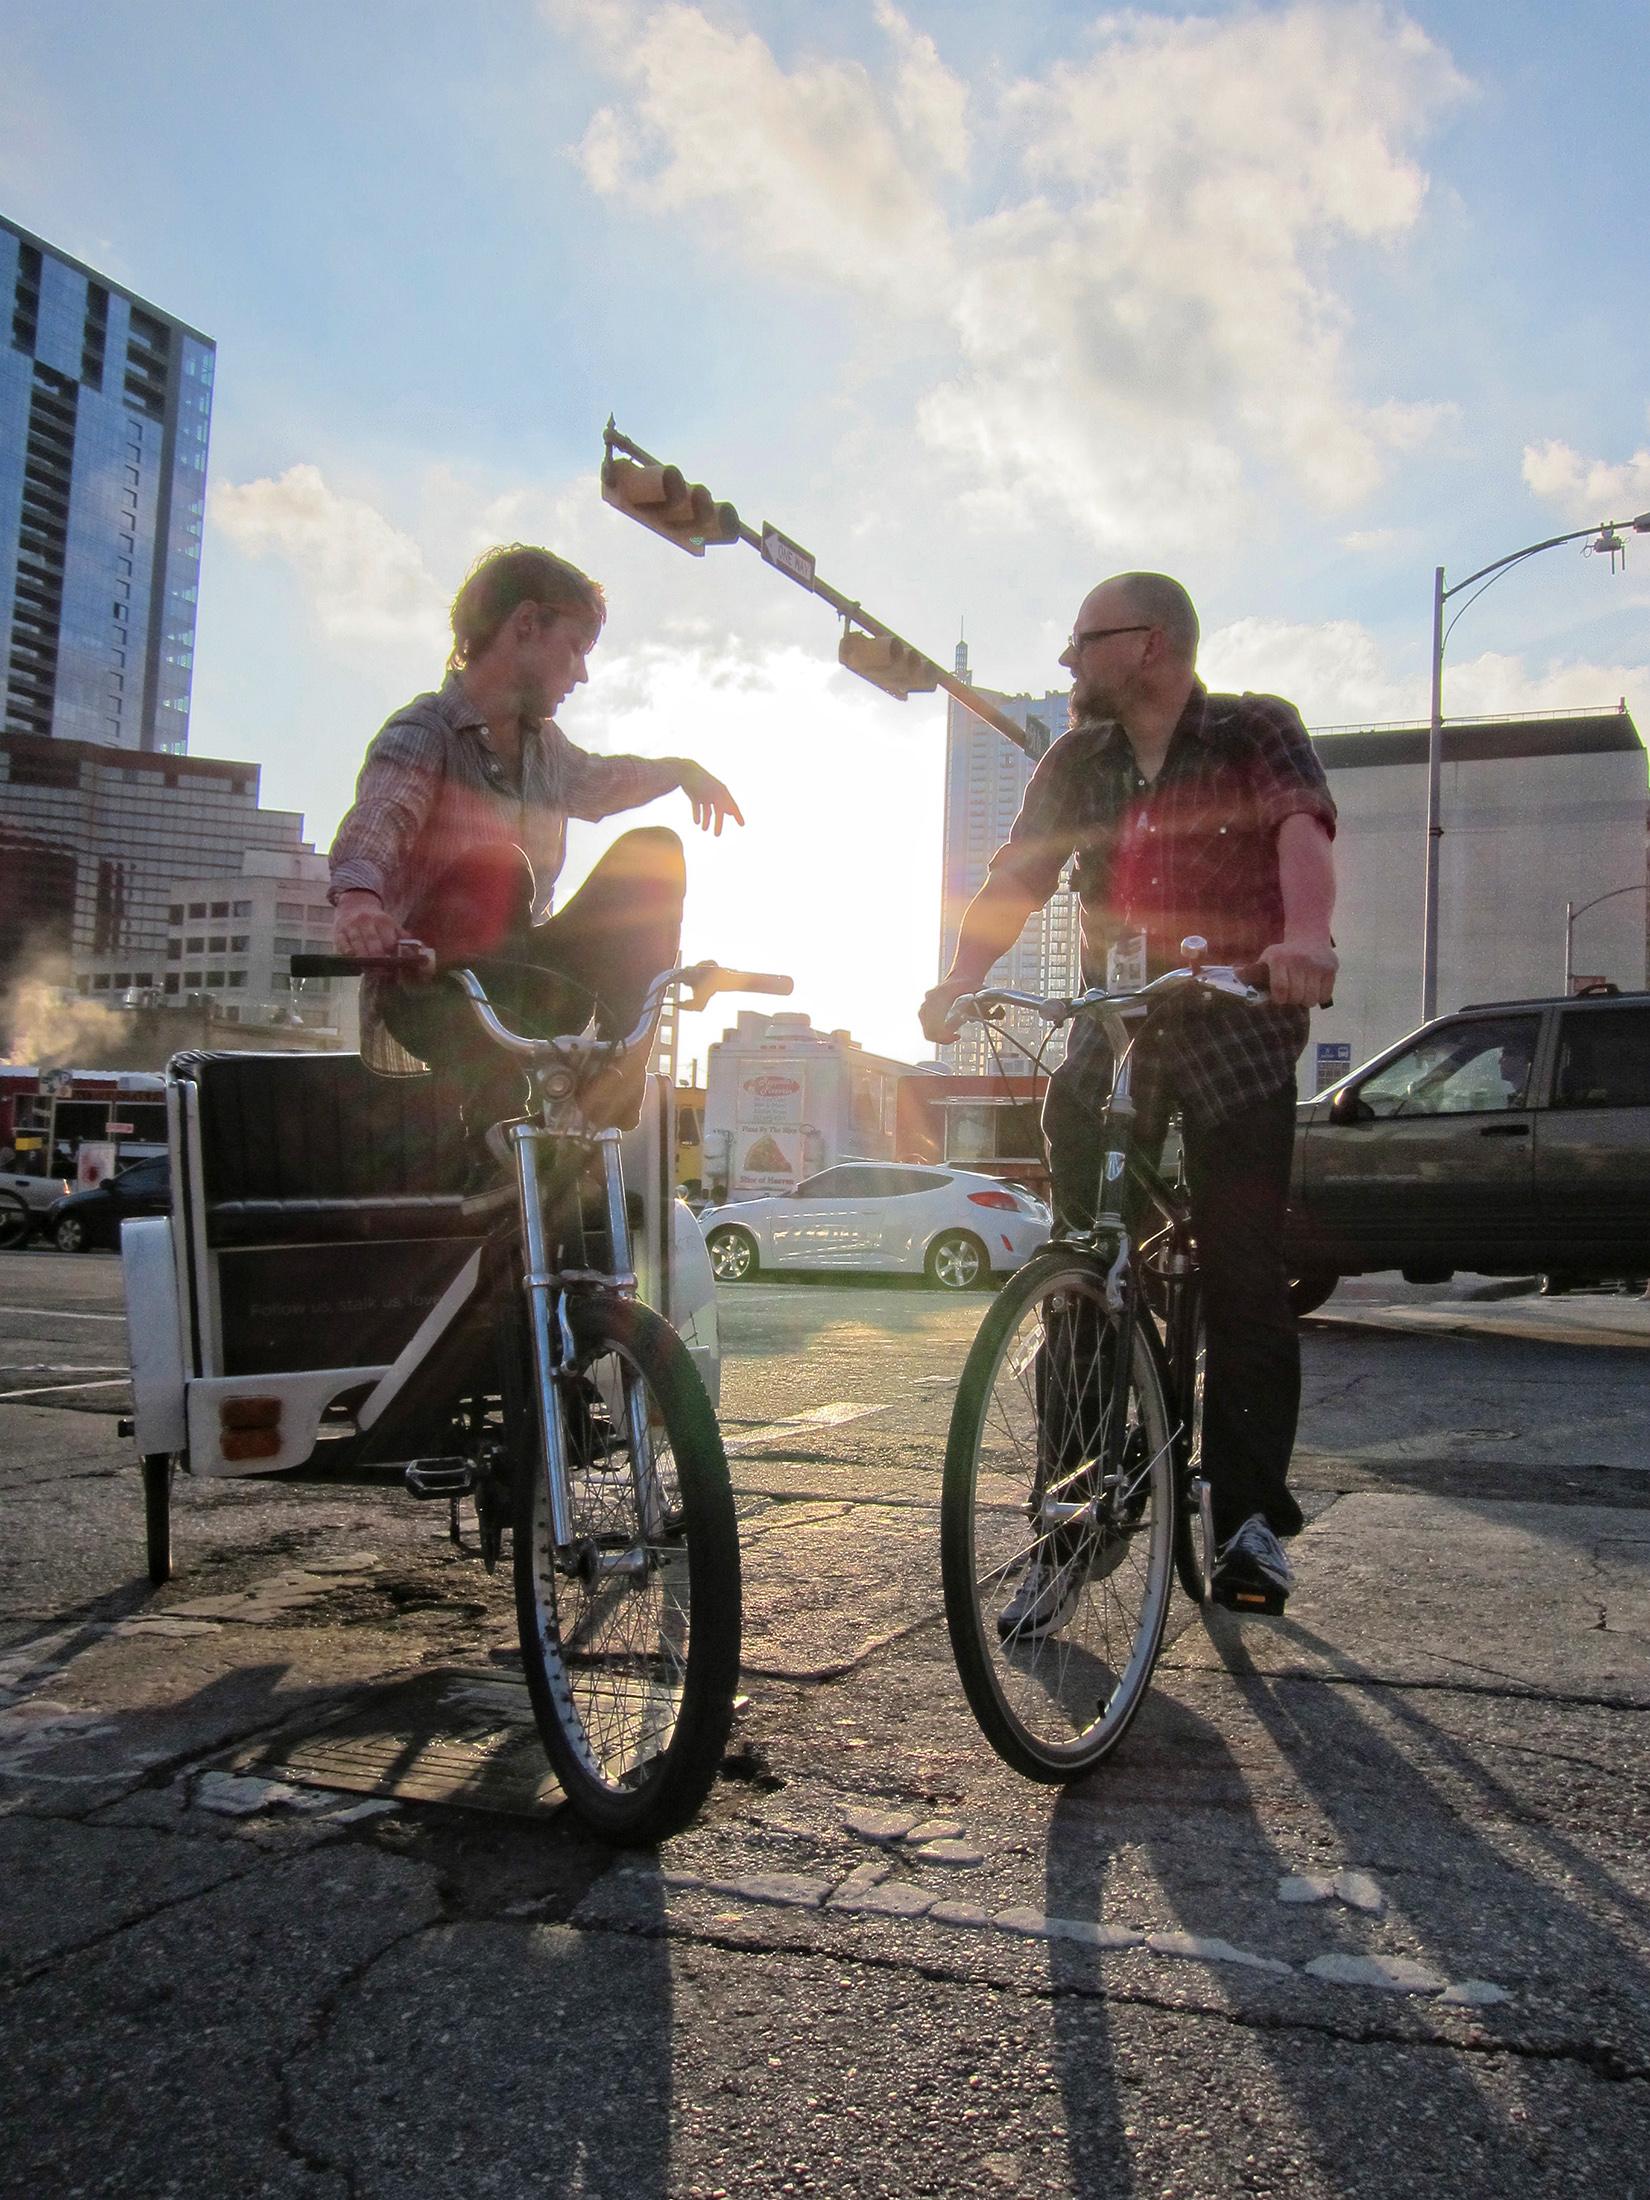 austin cyclists_edits.jpg